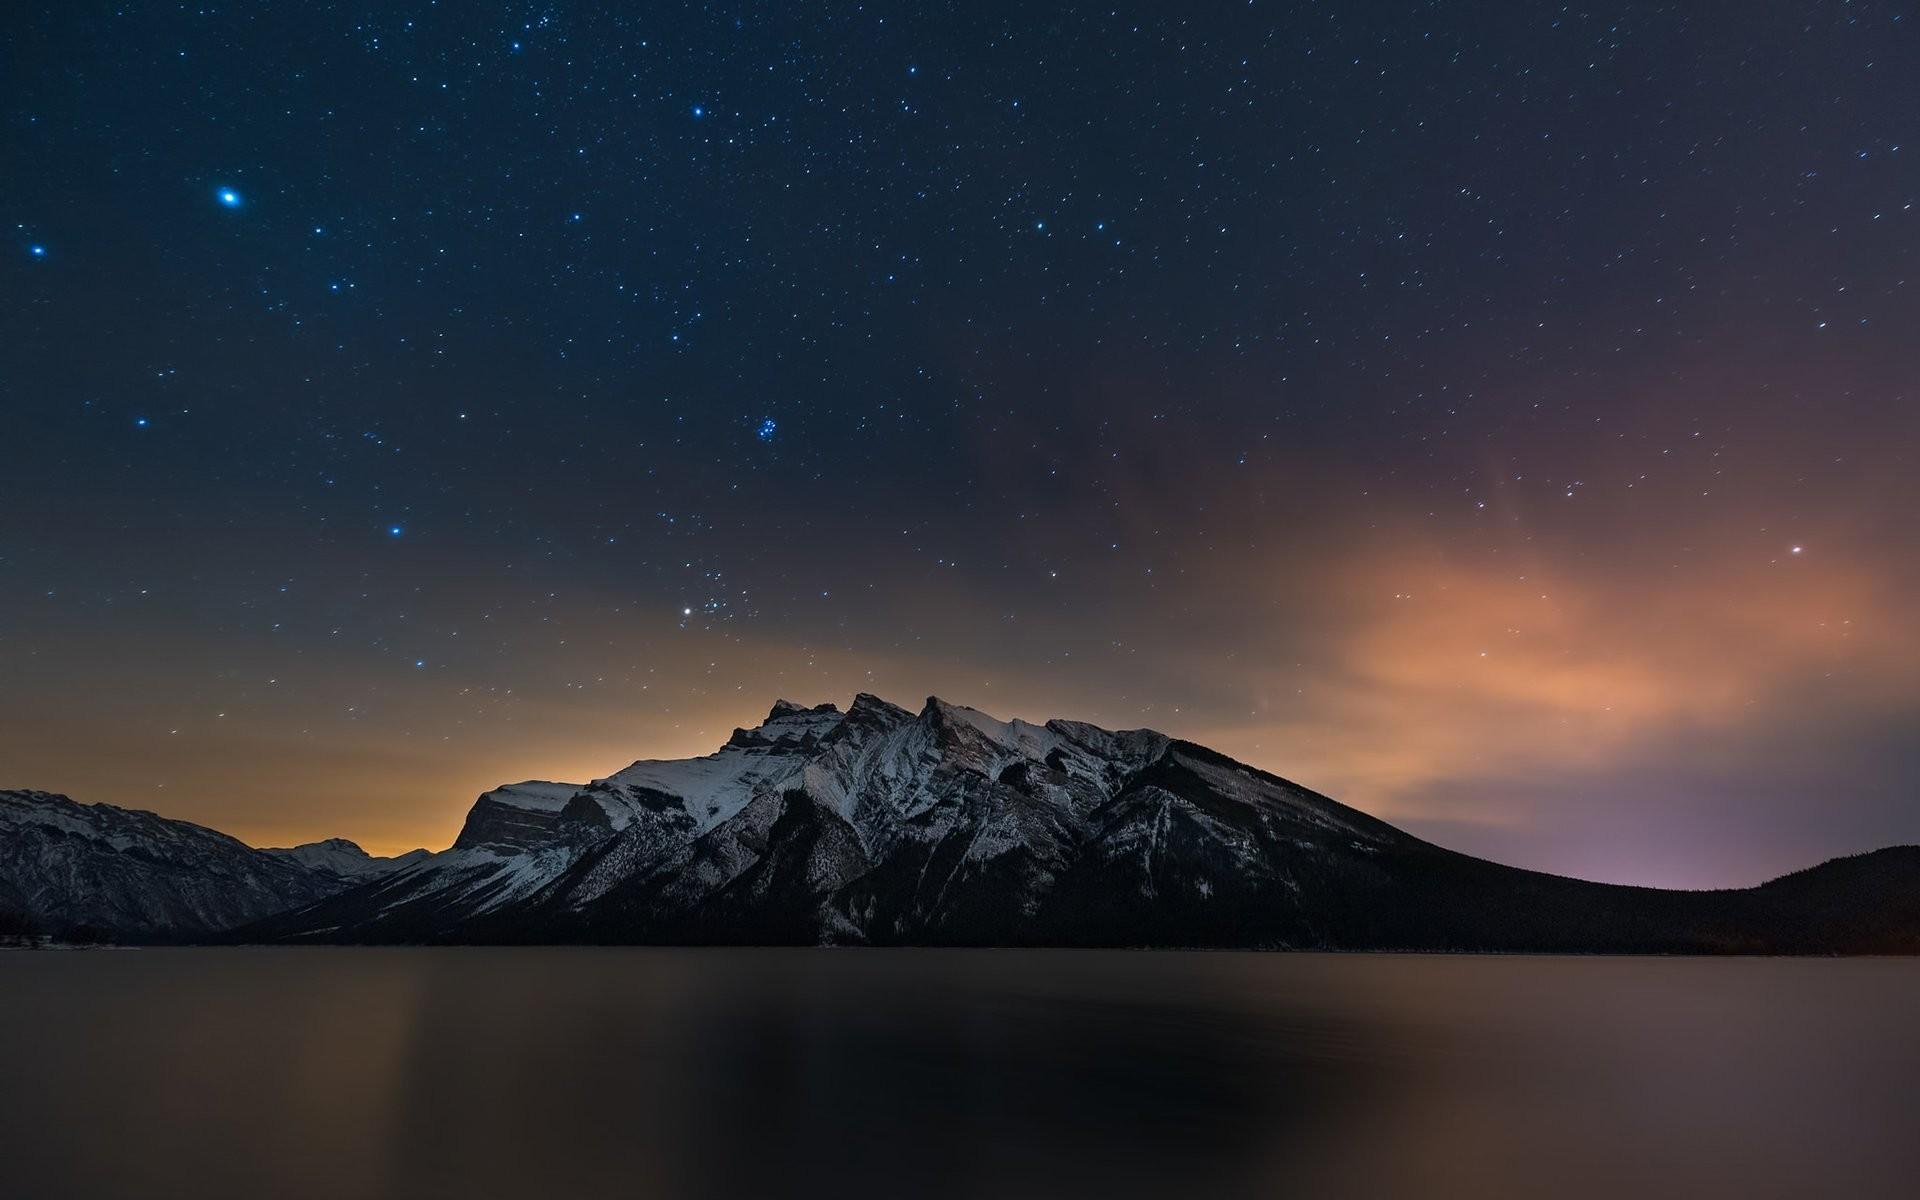 banff alberta canada lake mountain night stars